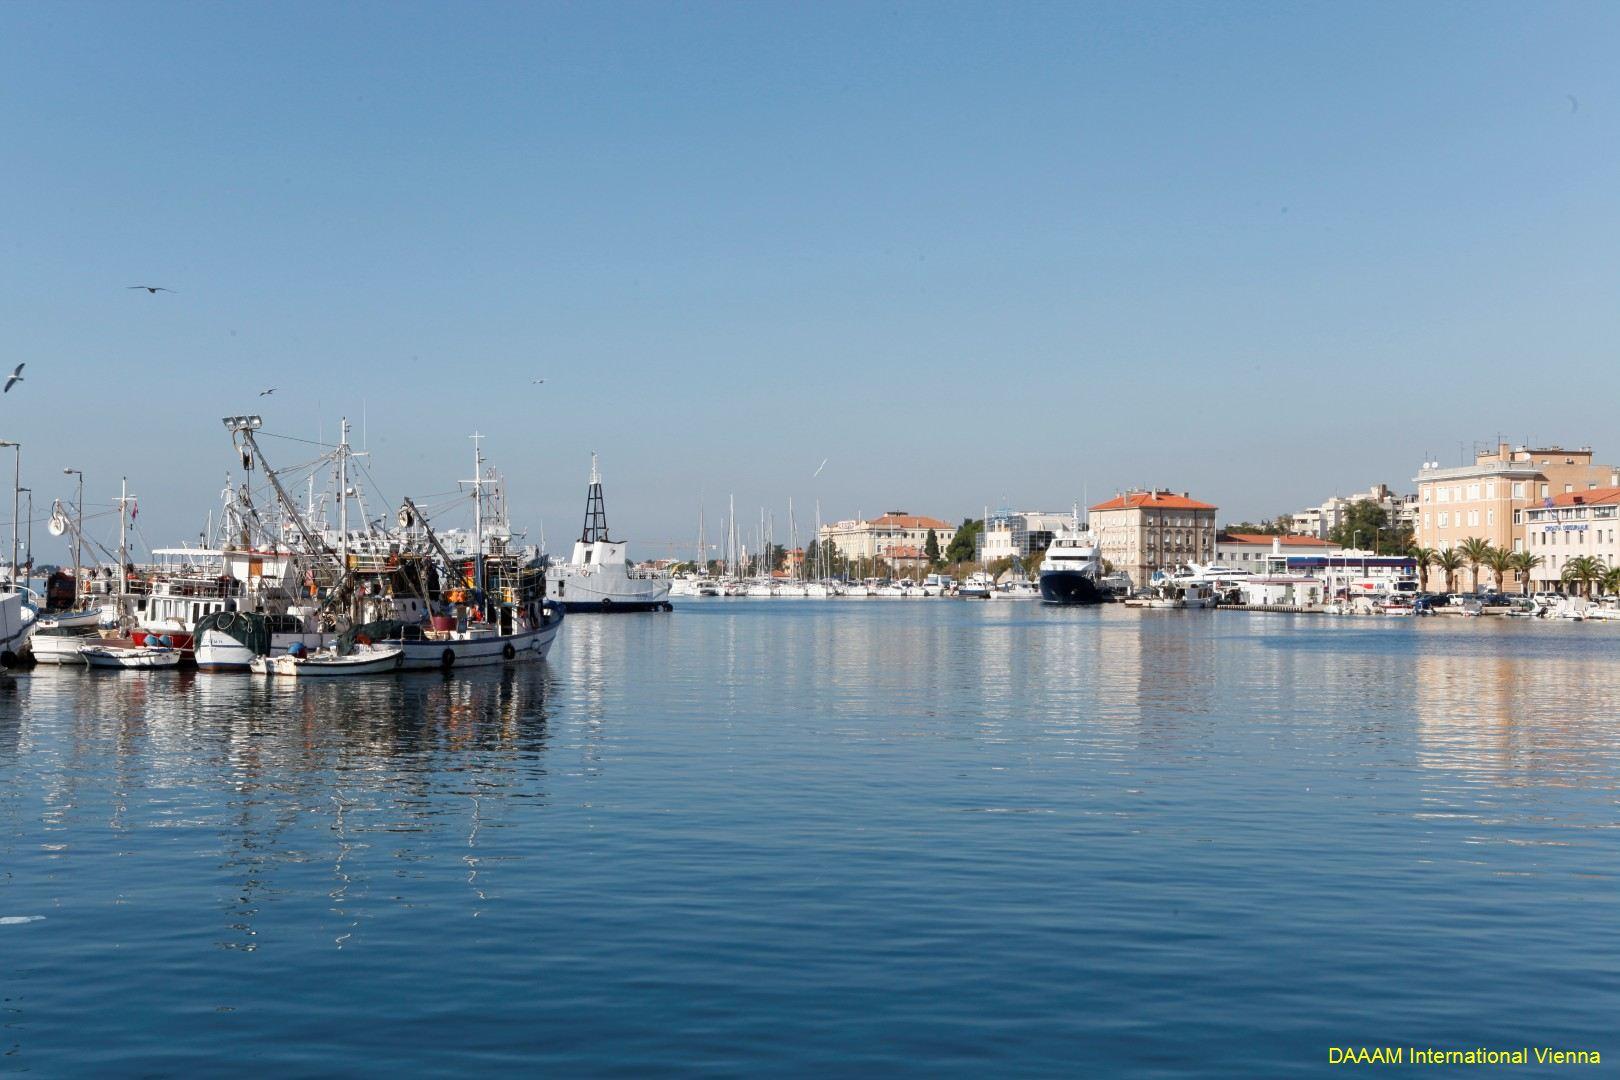 DAAAM_2012_Zadar_00_Zadar_City_001